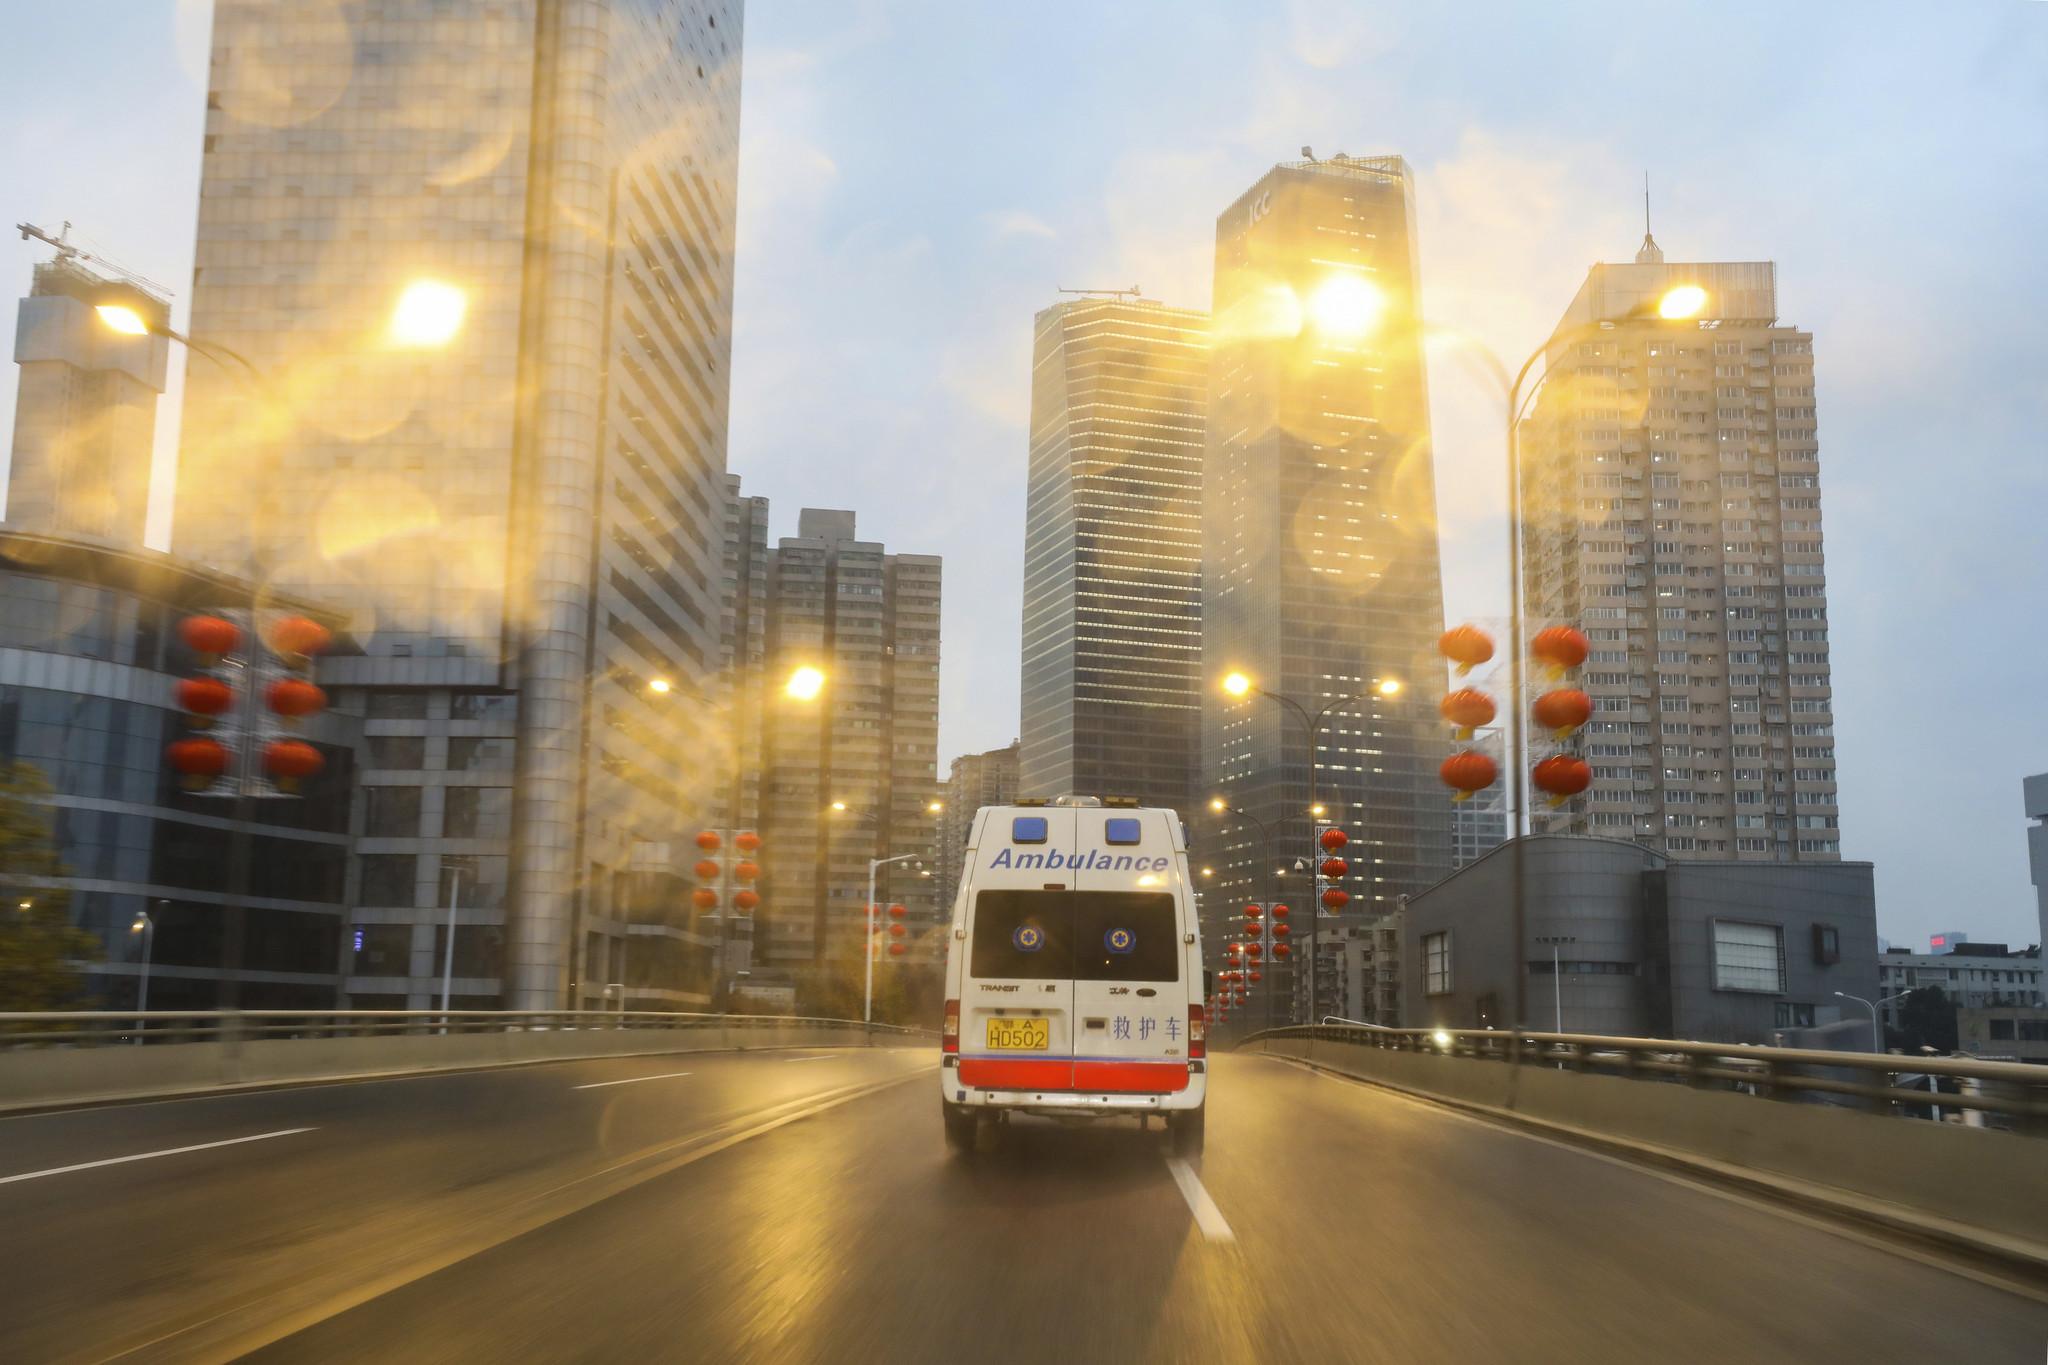 Coronavirus: a doctor's-eye view on the public health threat